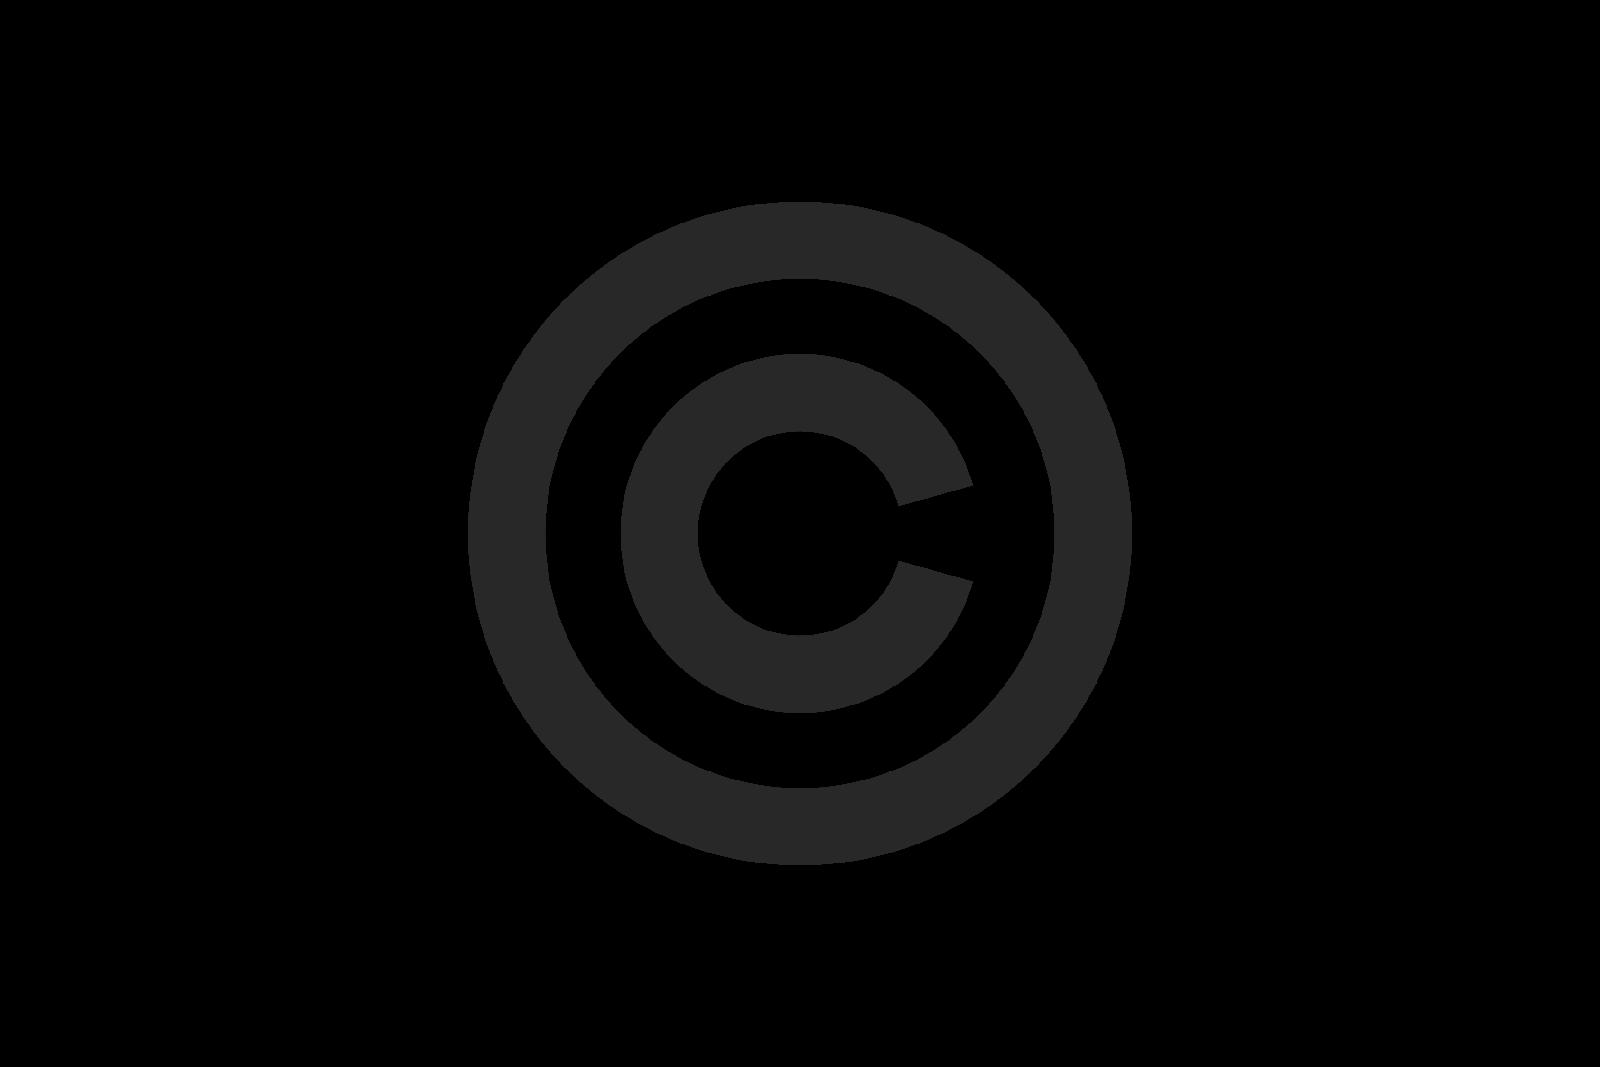 How To Copyright A Logos